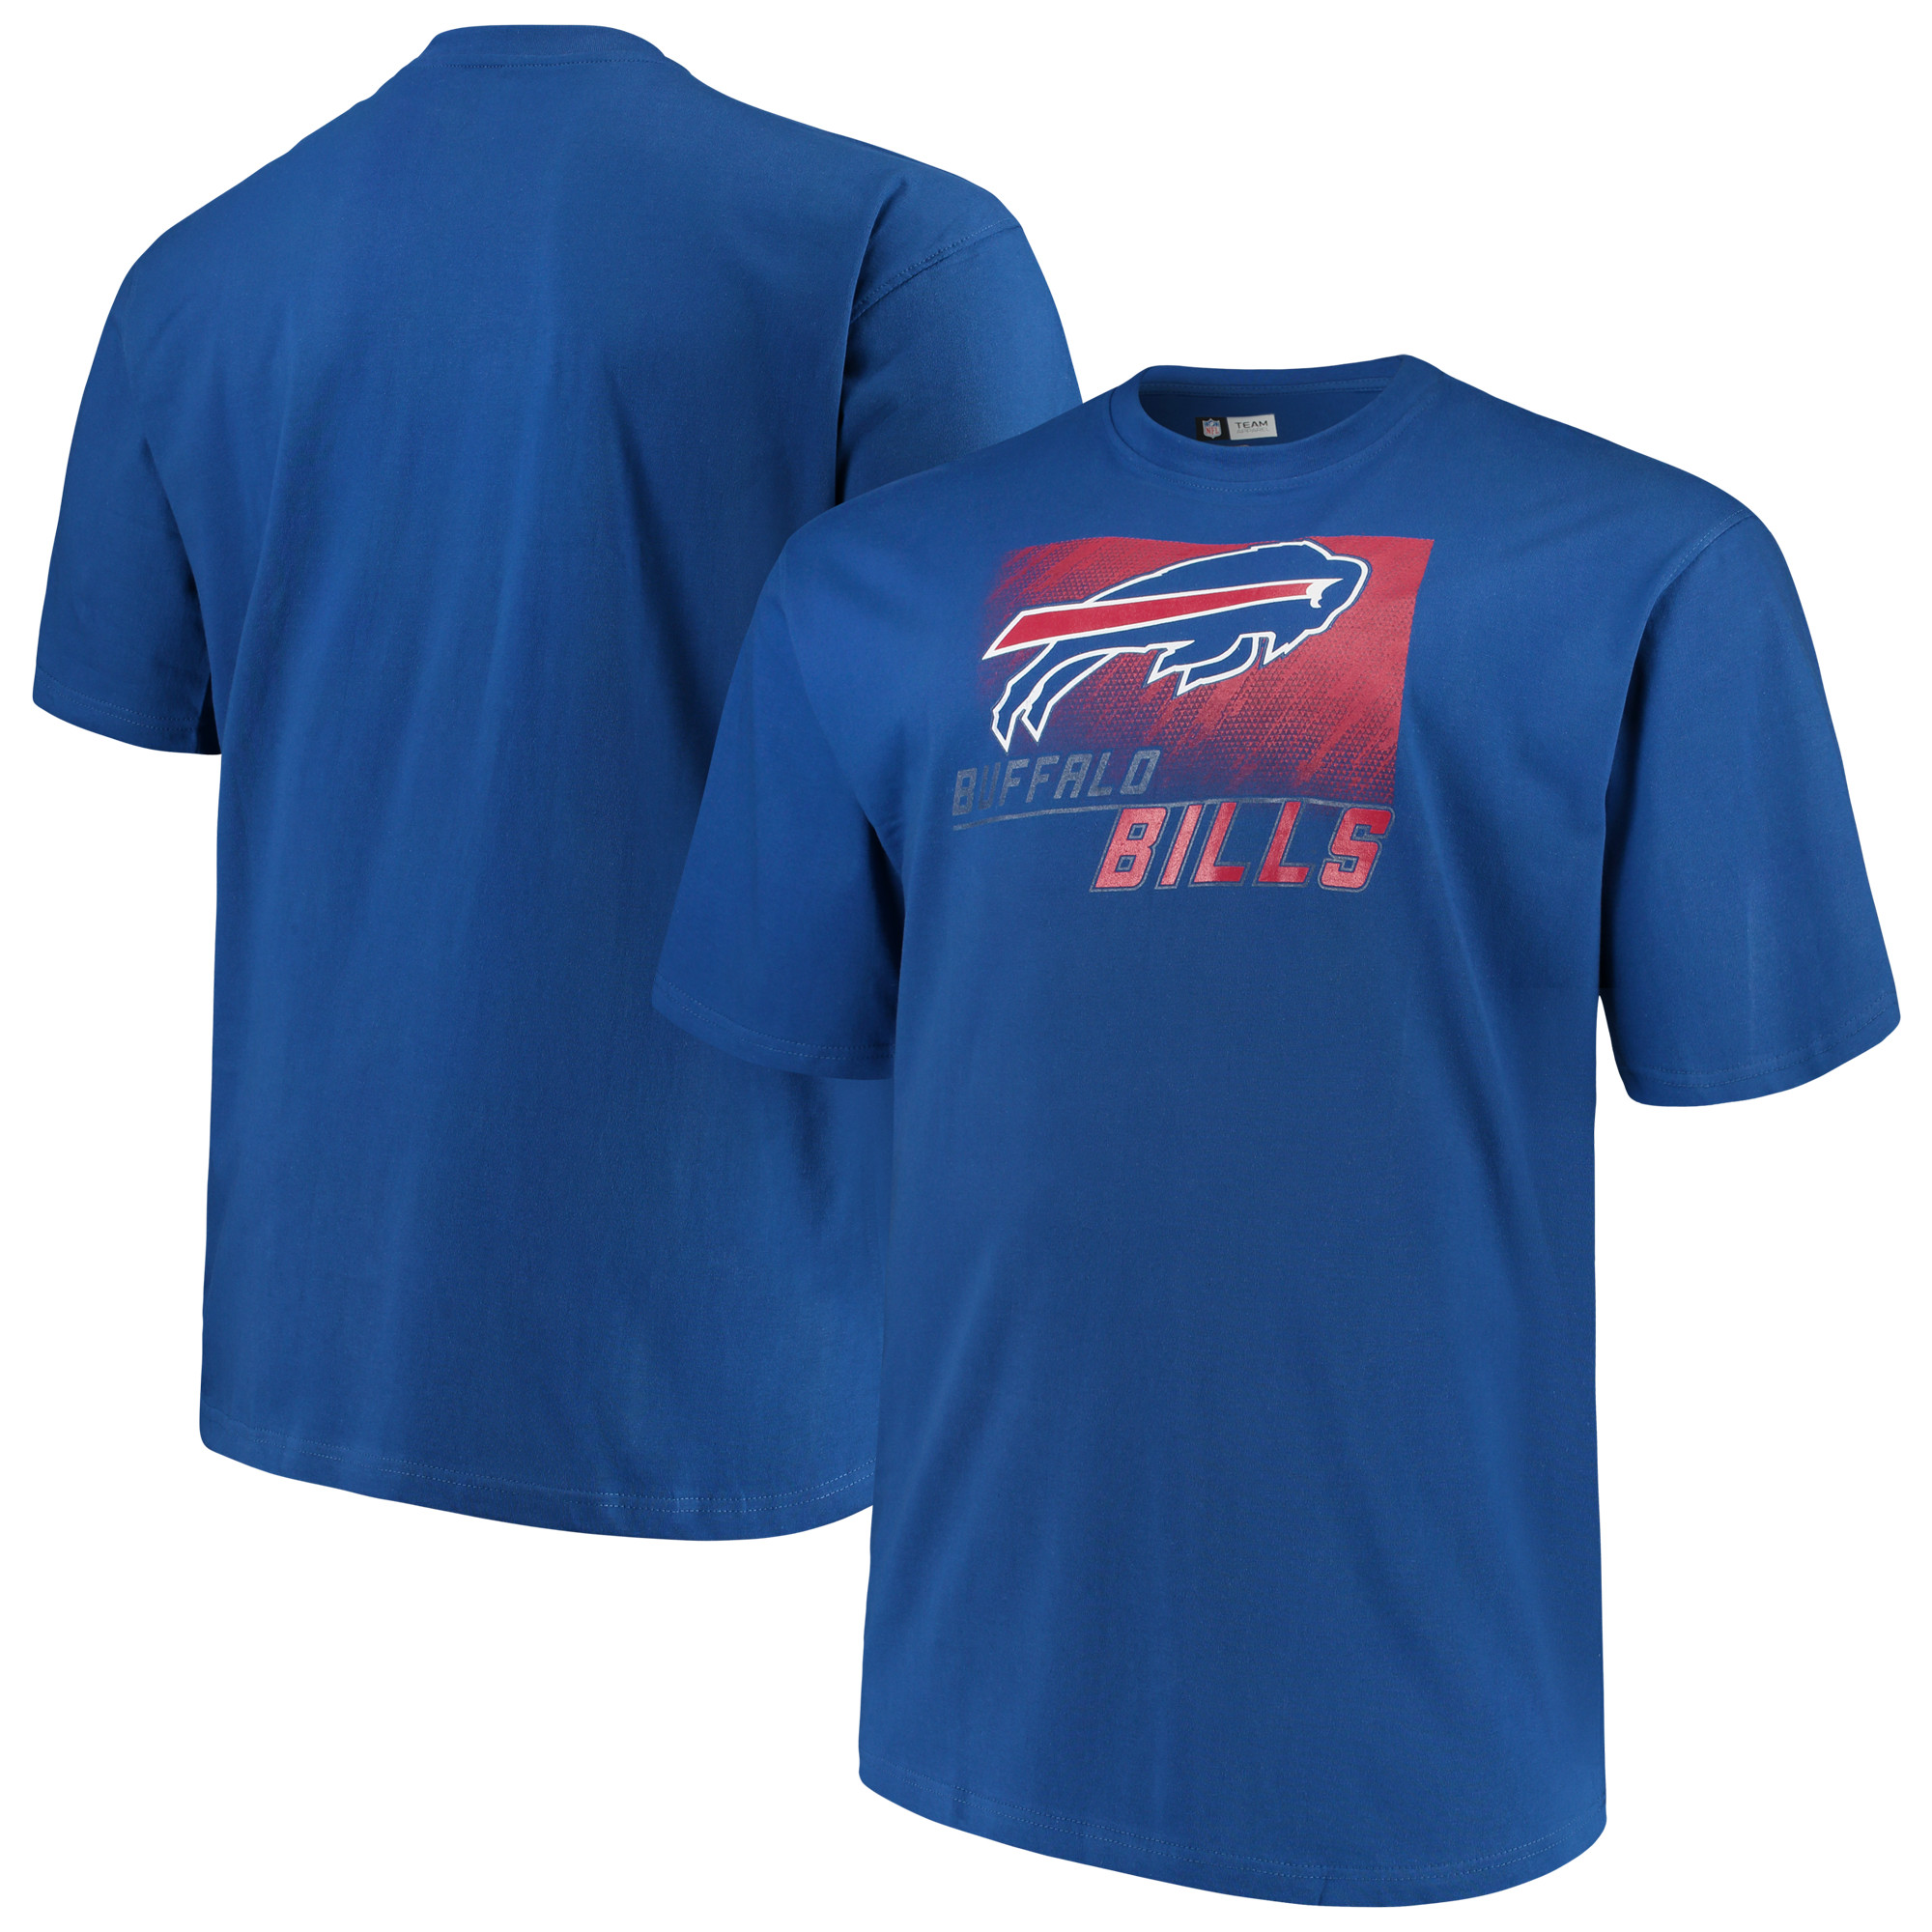 Men's Majestic Royal Buffalo Bills Big & Tall Reflective T-Shirt